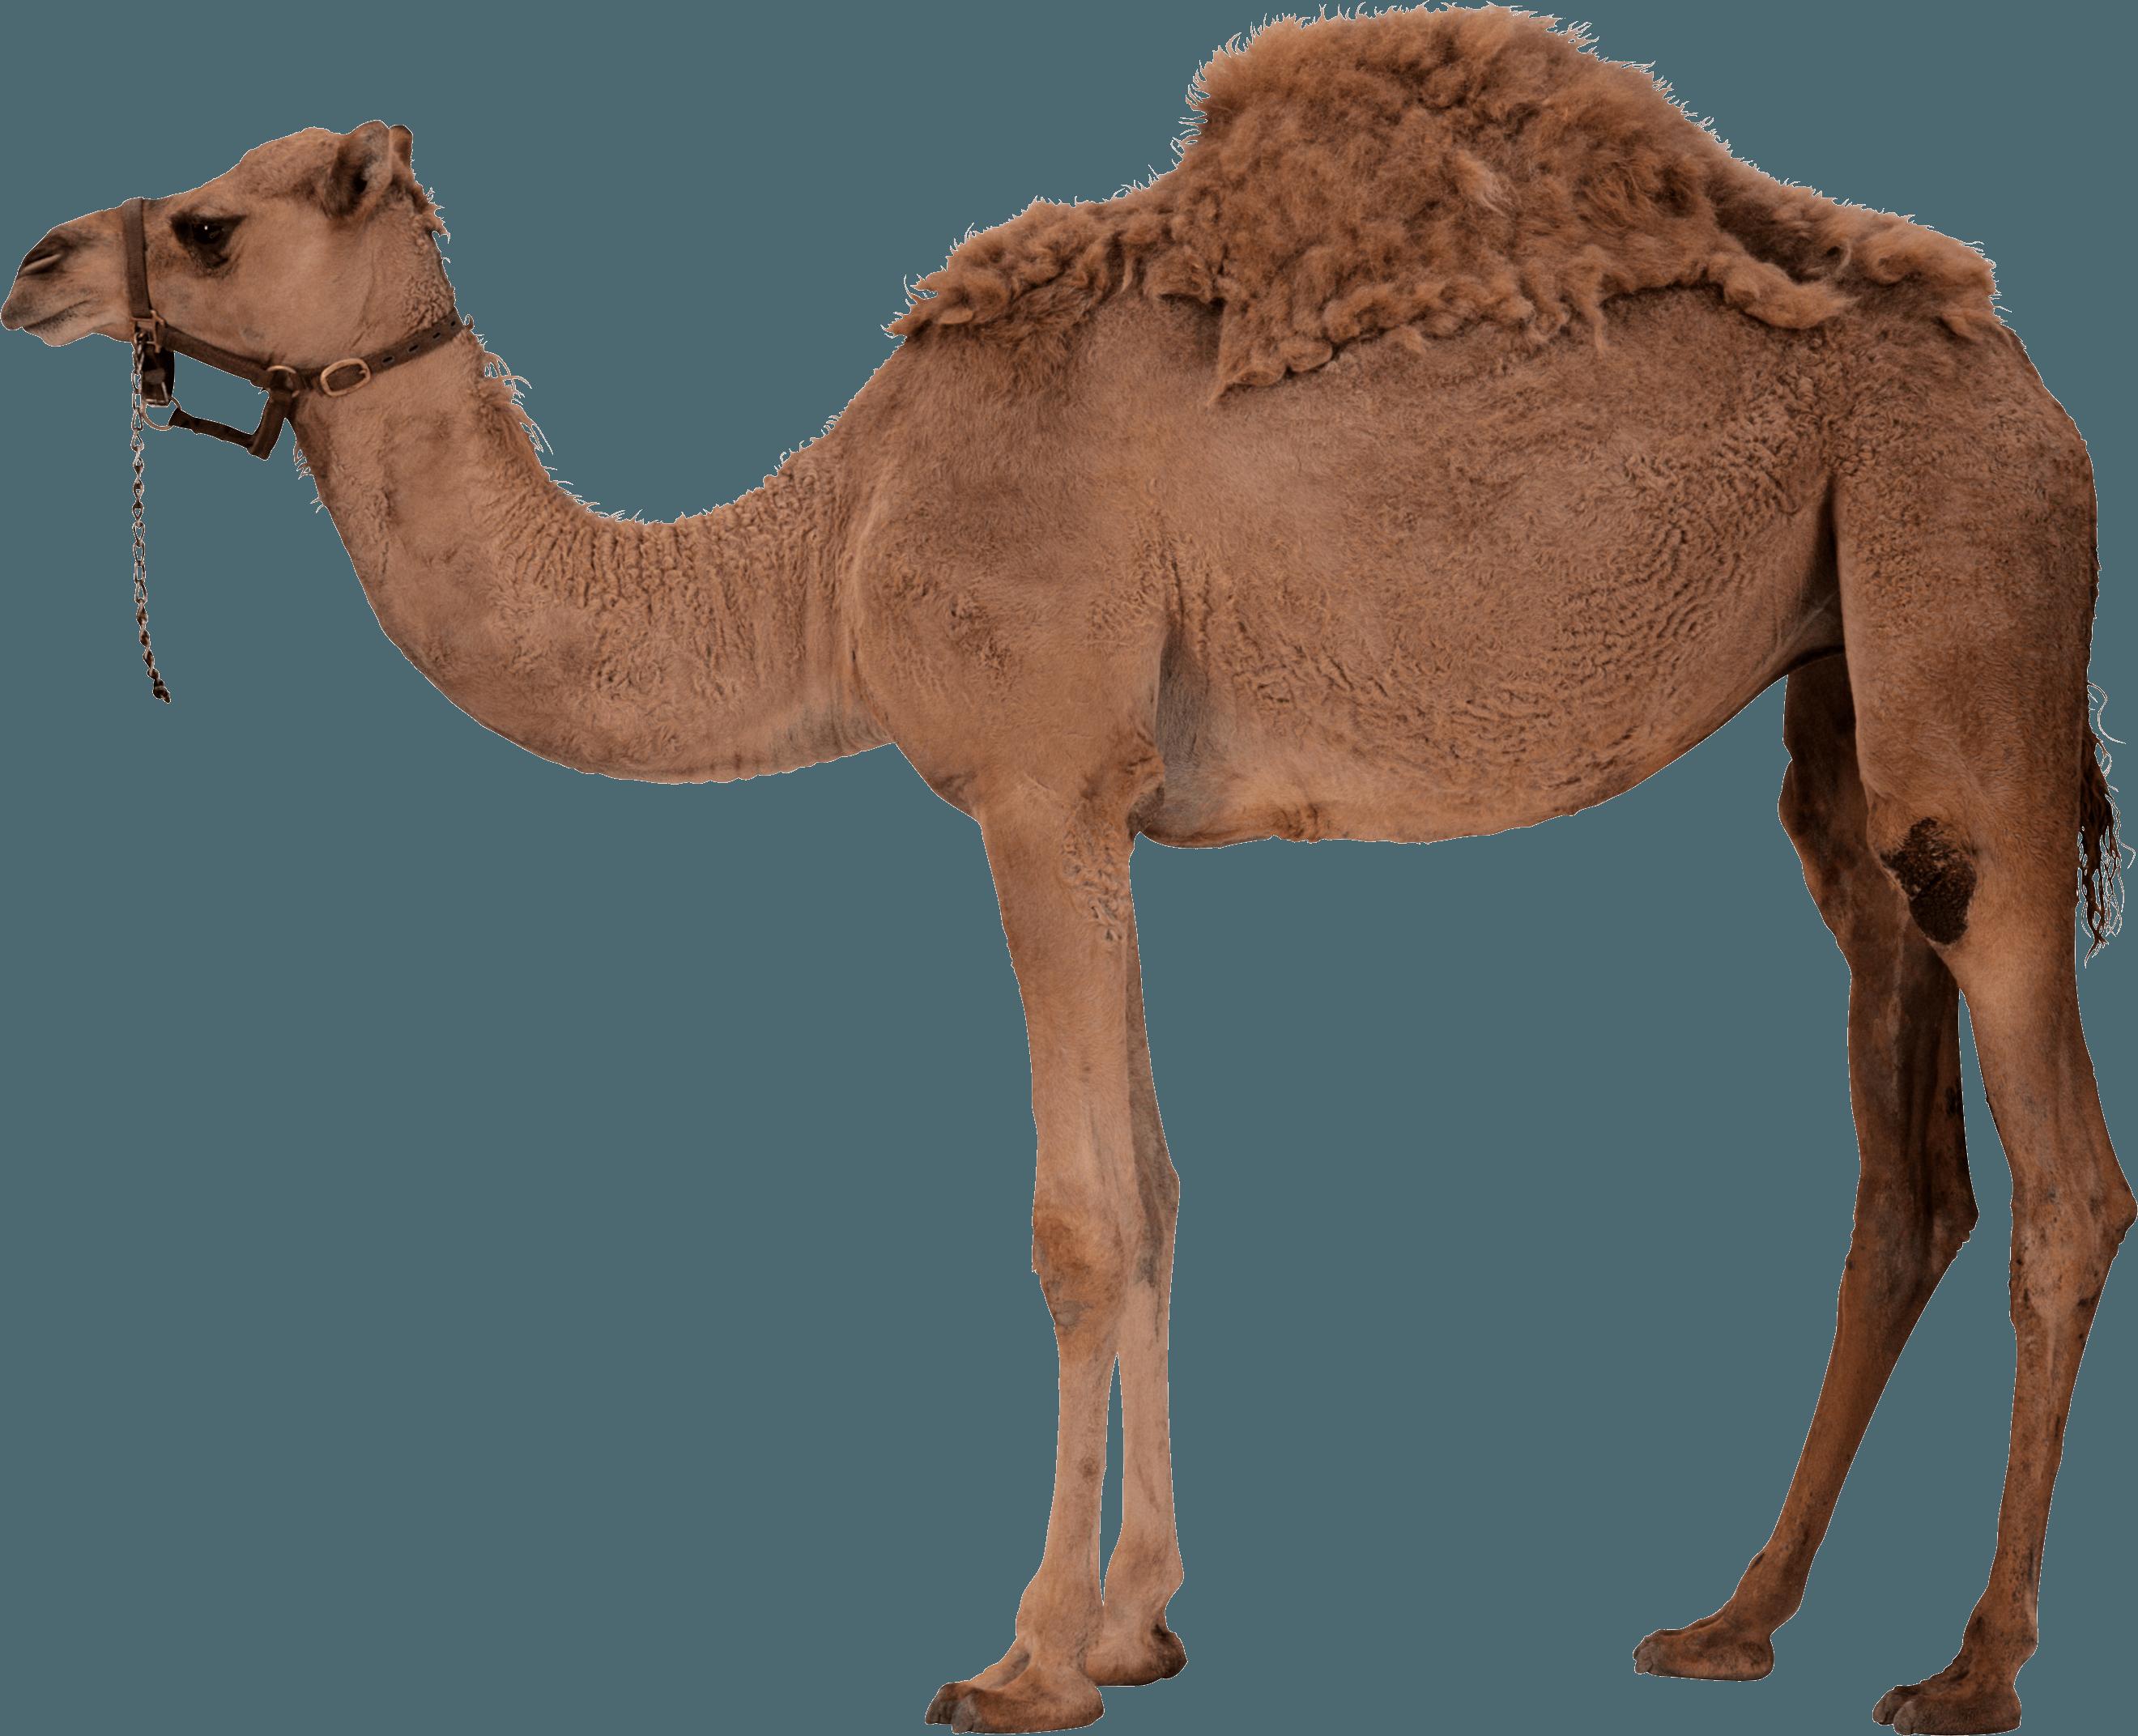 Camel PNG Image - PurePNG | Free transparent CC0 PNG Image Library